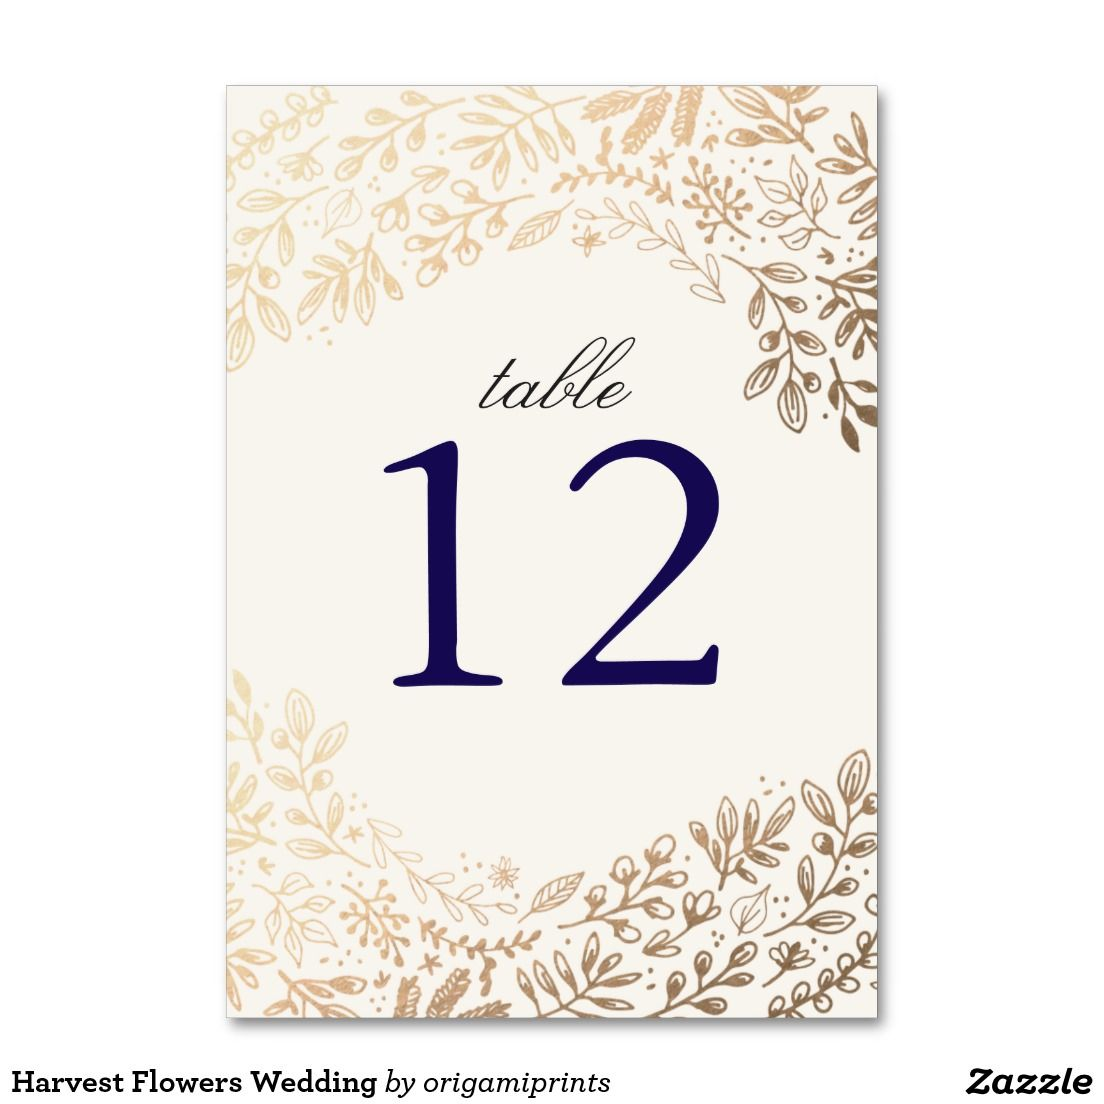 Your custom vertical table card wedding